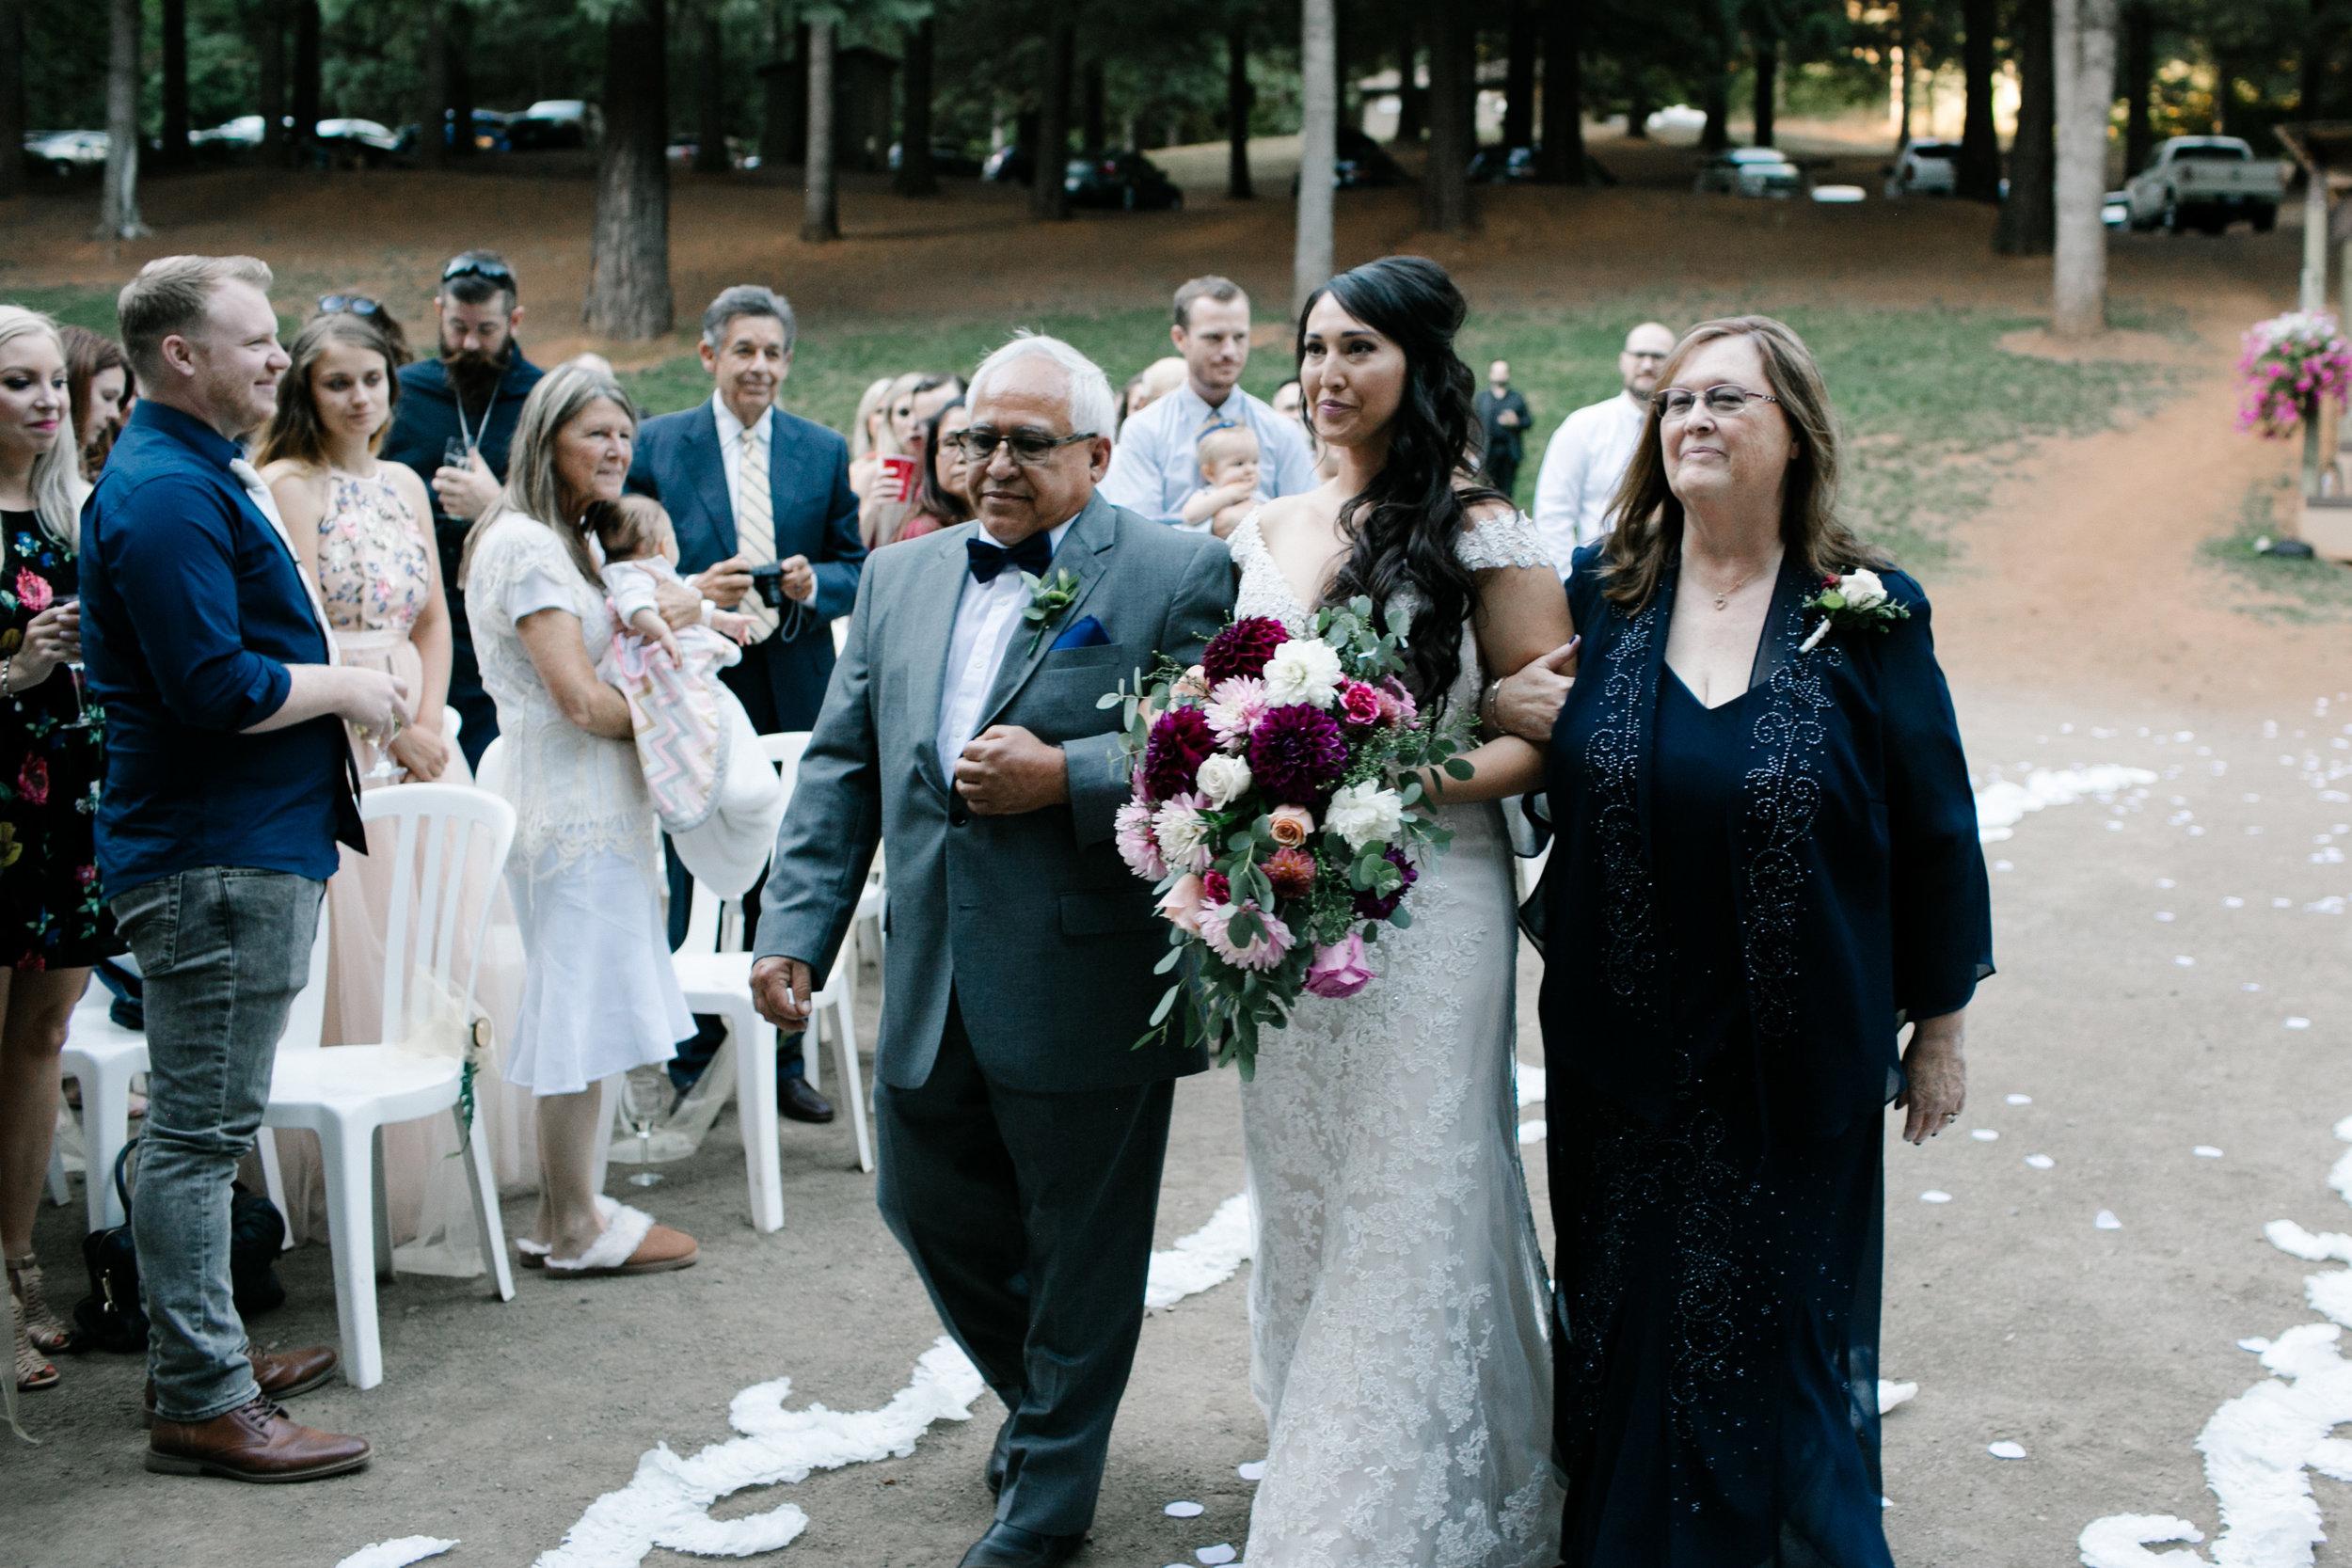 Sevlynn-Photography-Teresa-Chandler-Wedding-48.jpg